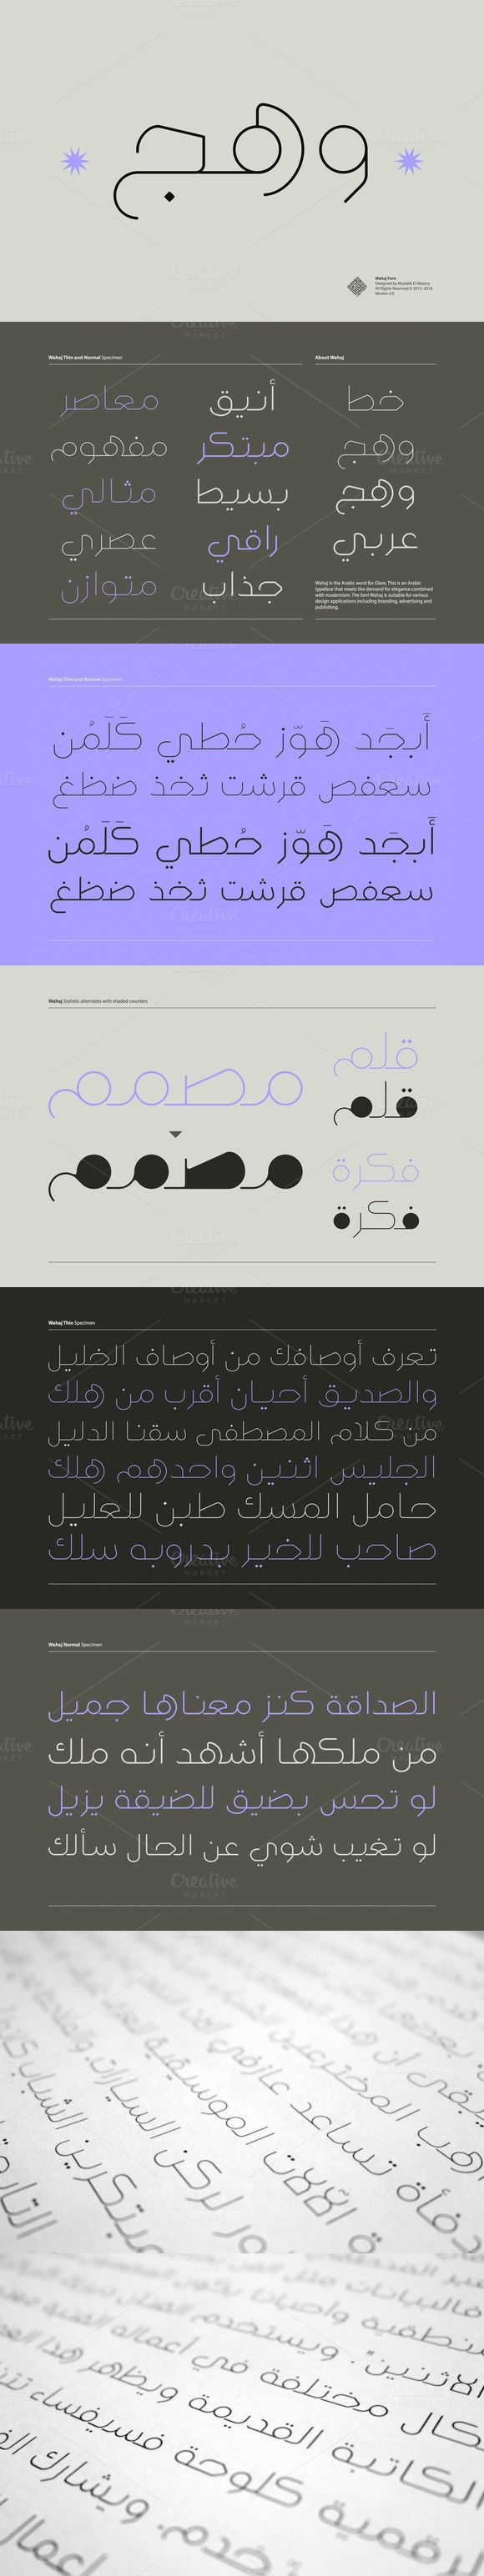 Wahaj Arabic Font. Non Western Fonts. $20.00